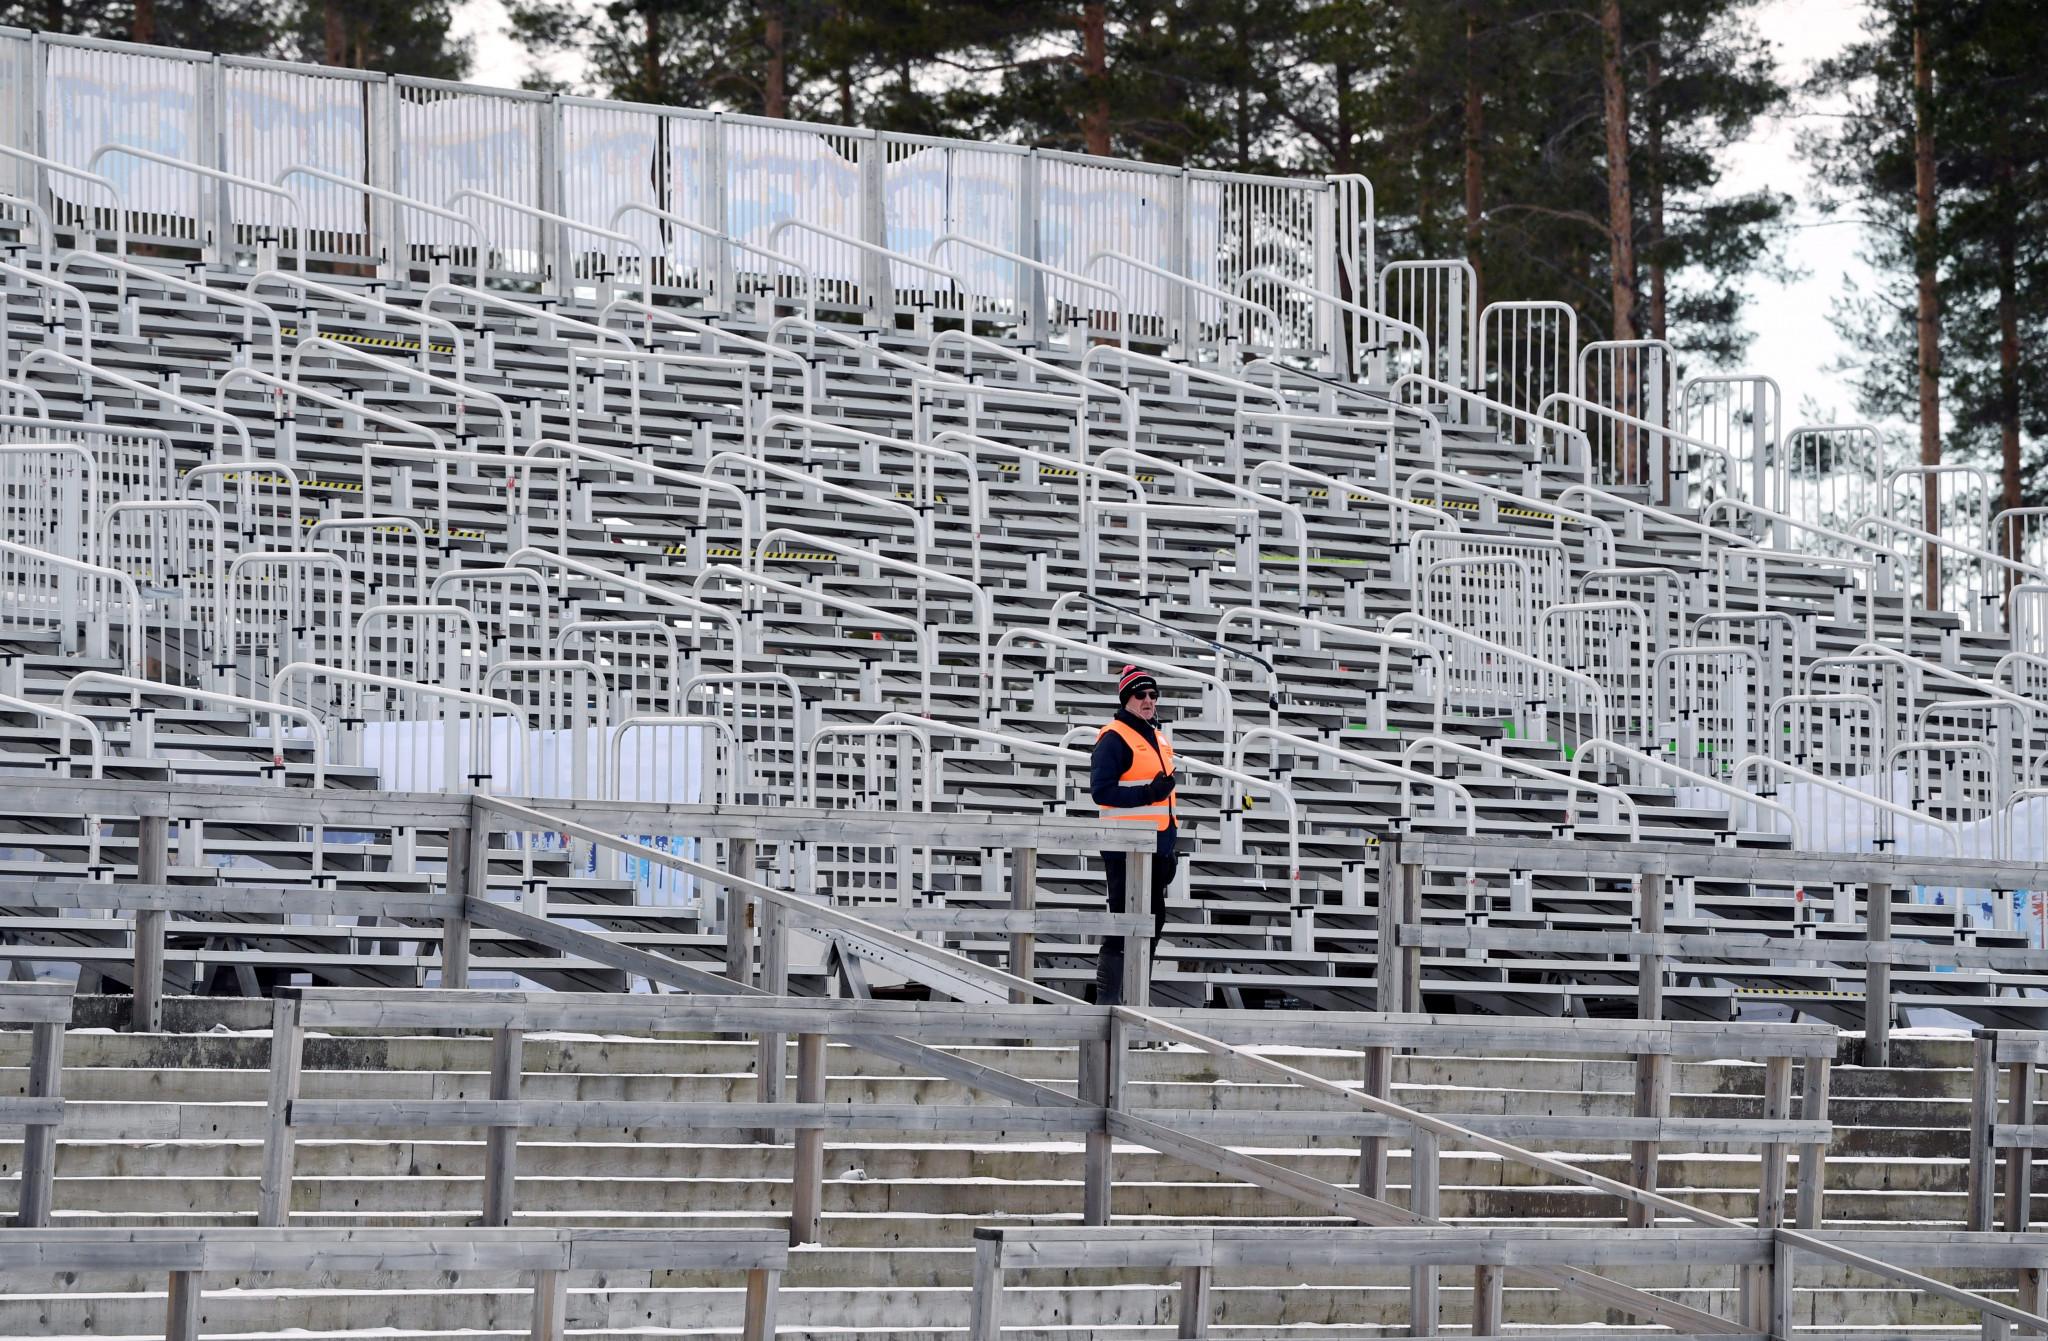 Five teams record positive coronavirus cases prior to IBU World Cup in Kontiolahti